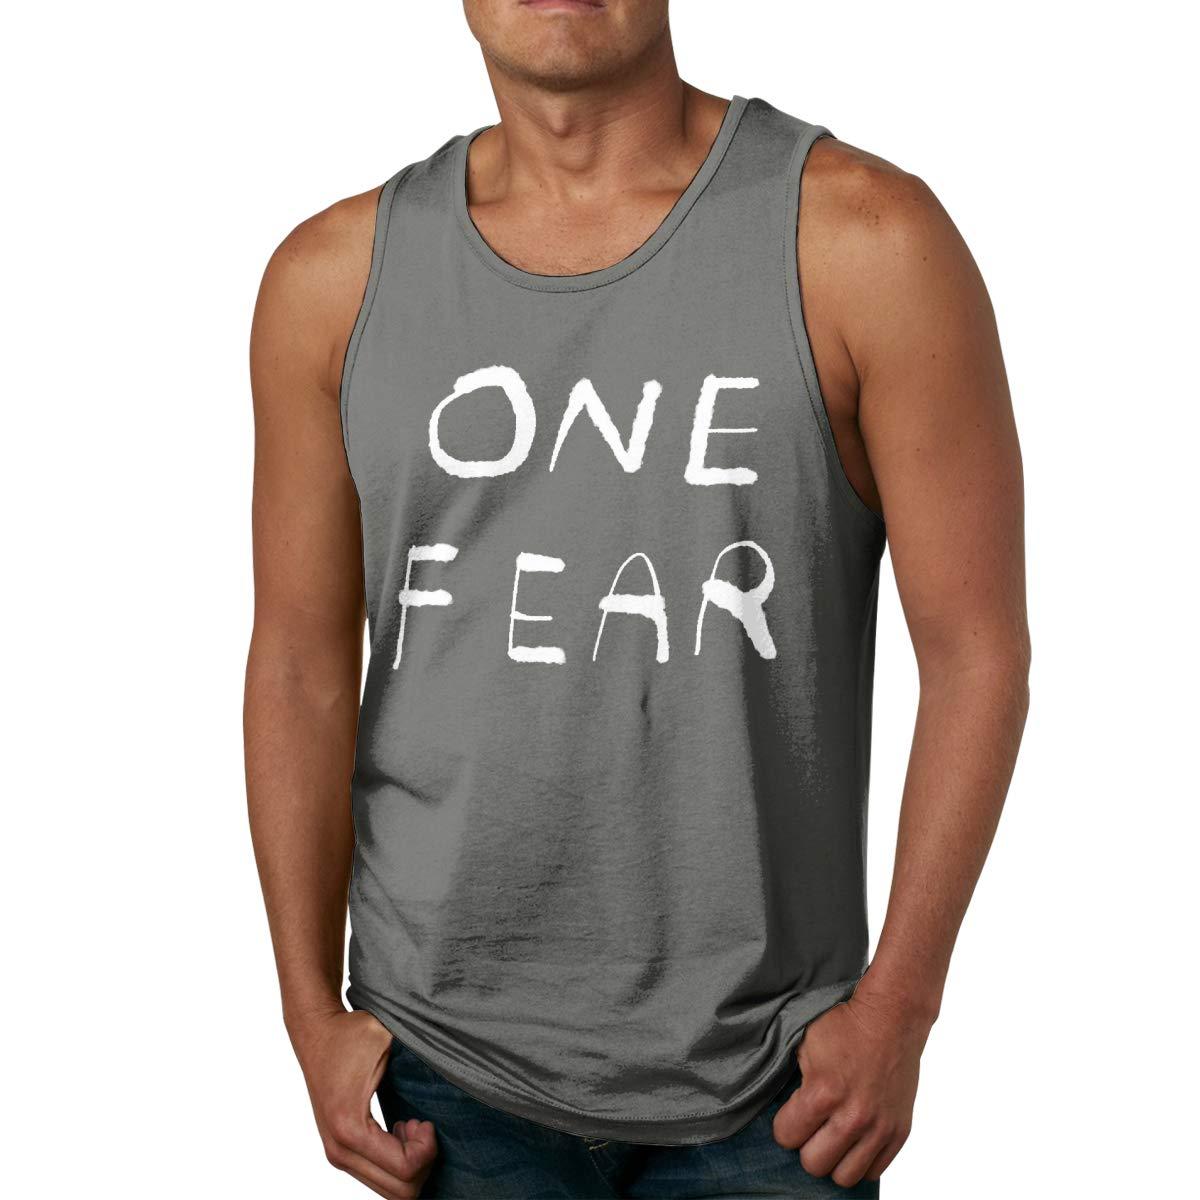 Vanmass S One R Sleeveless Tank Top Shirts